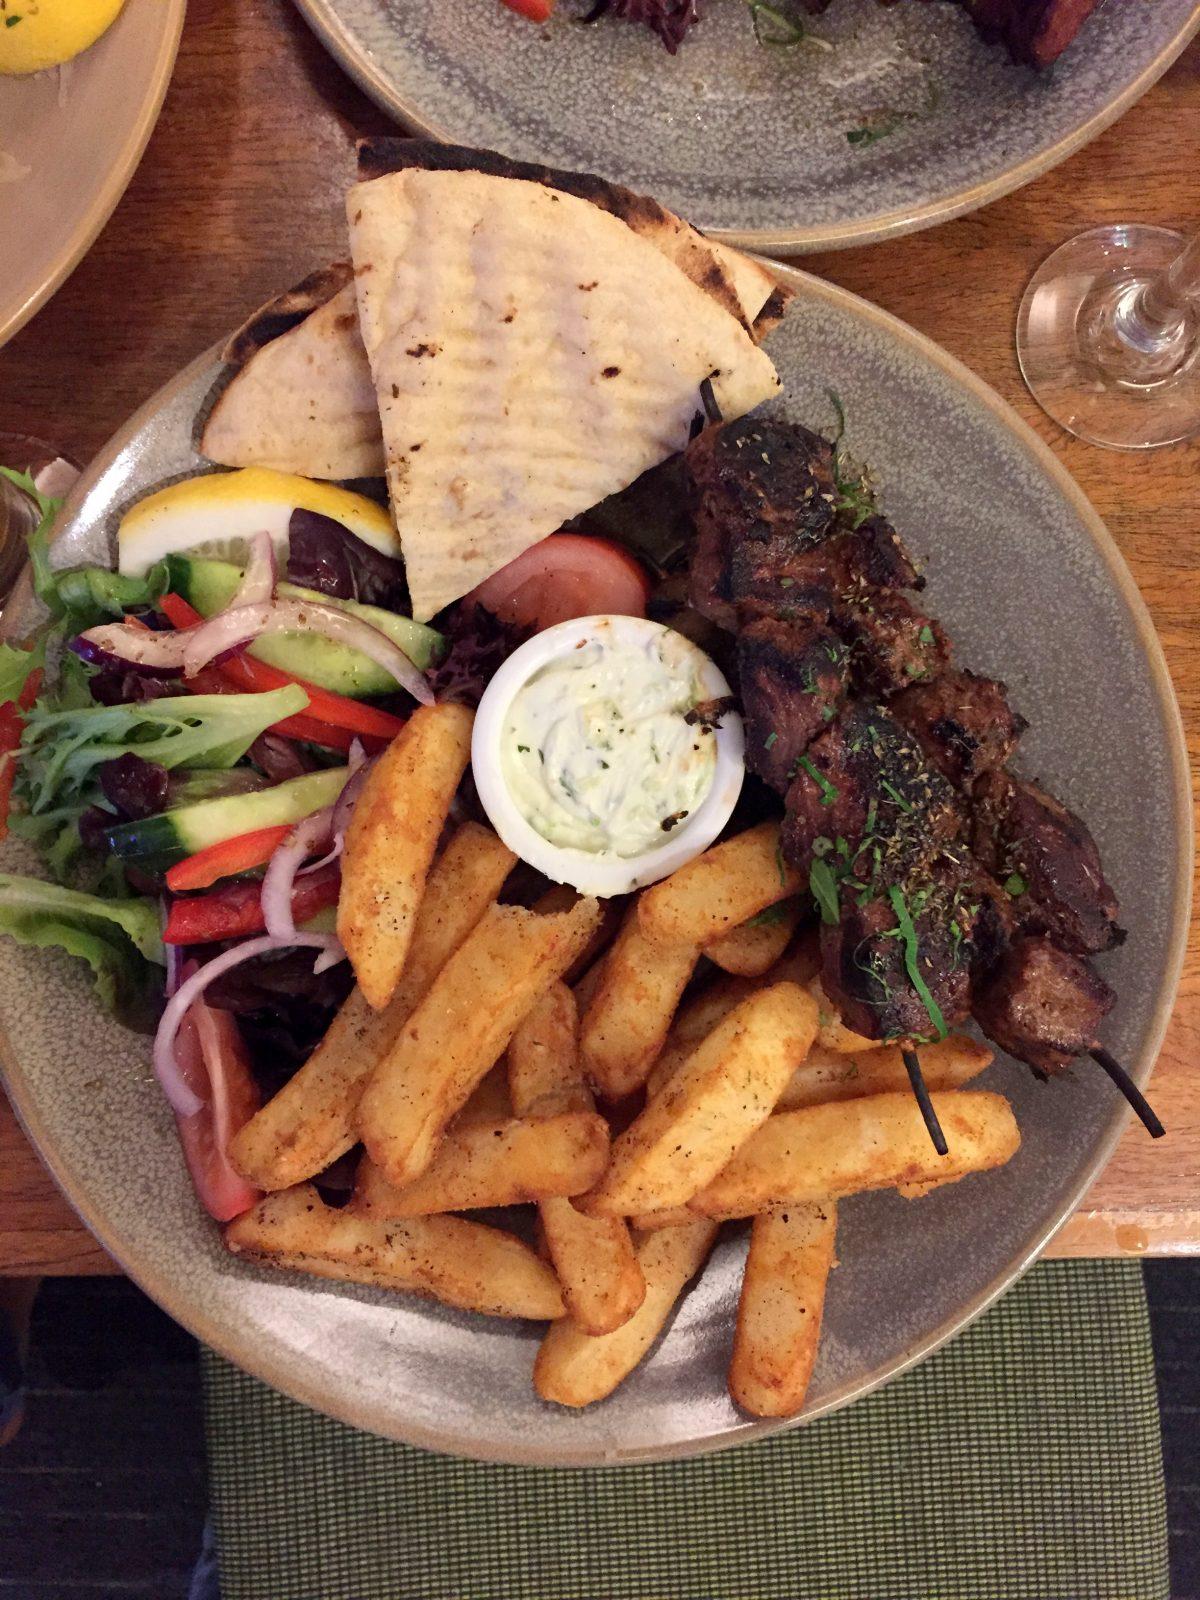 Open lamb souvlaki with tzatzki, chips, salad and pita bread